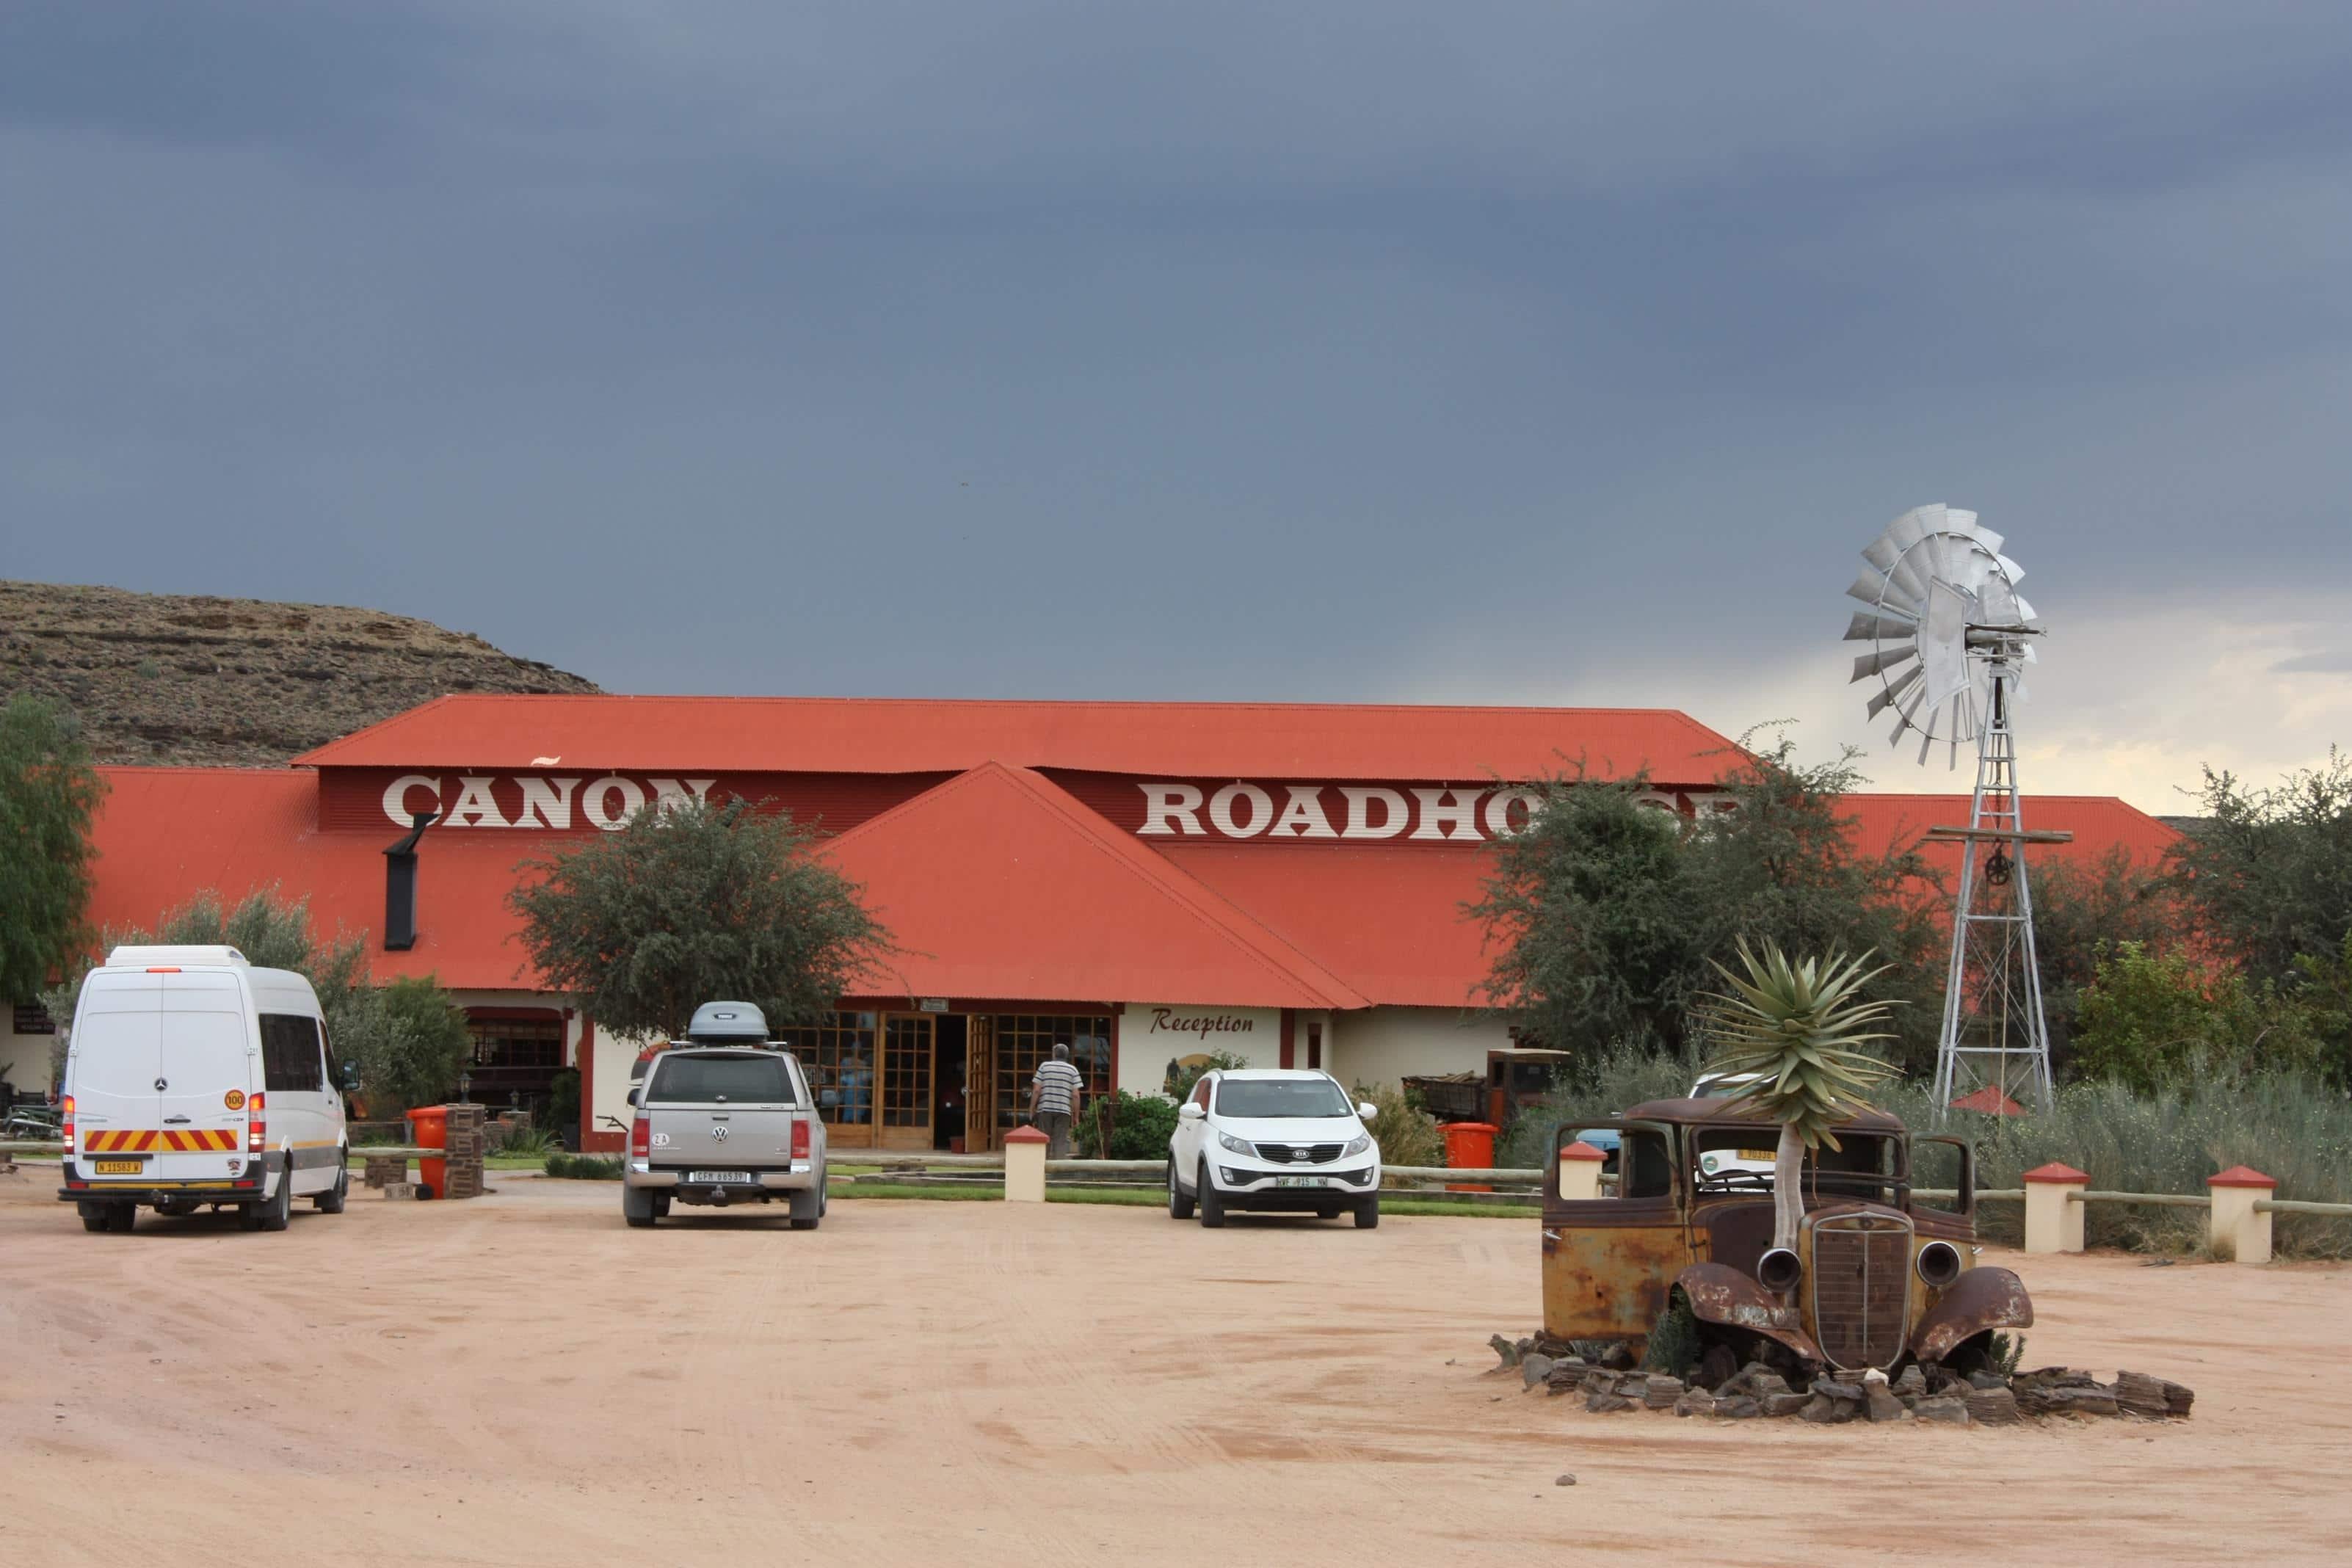 Canon Roadhouse